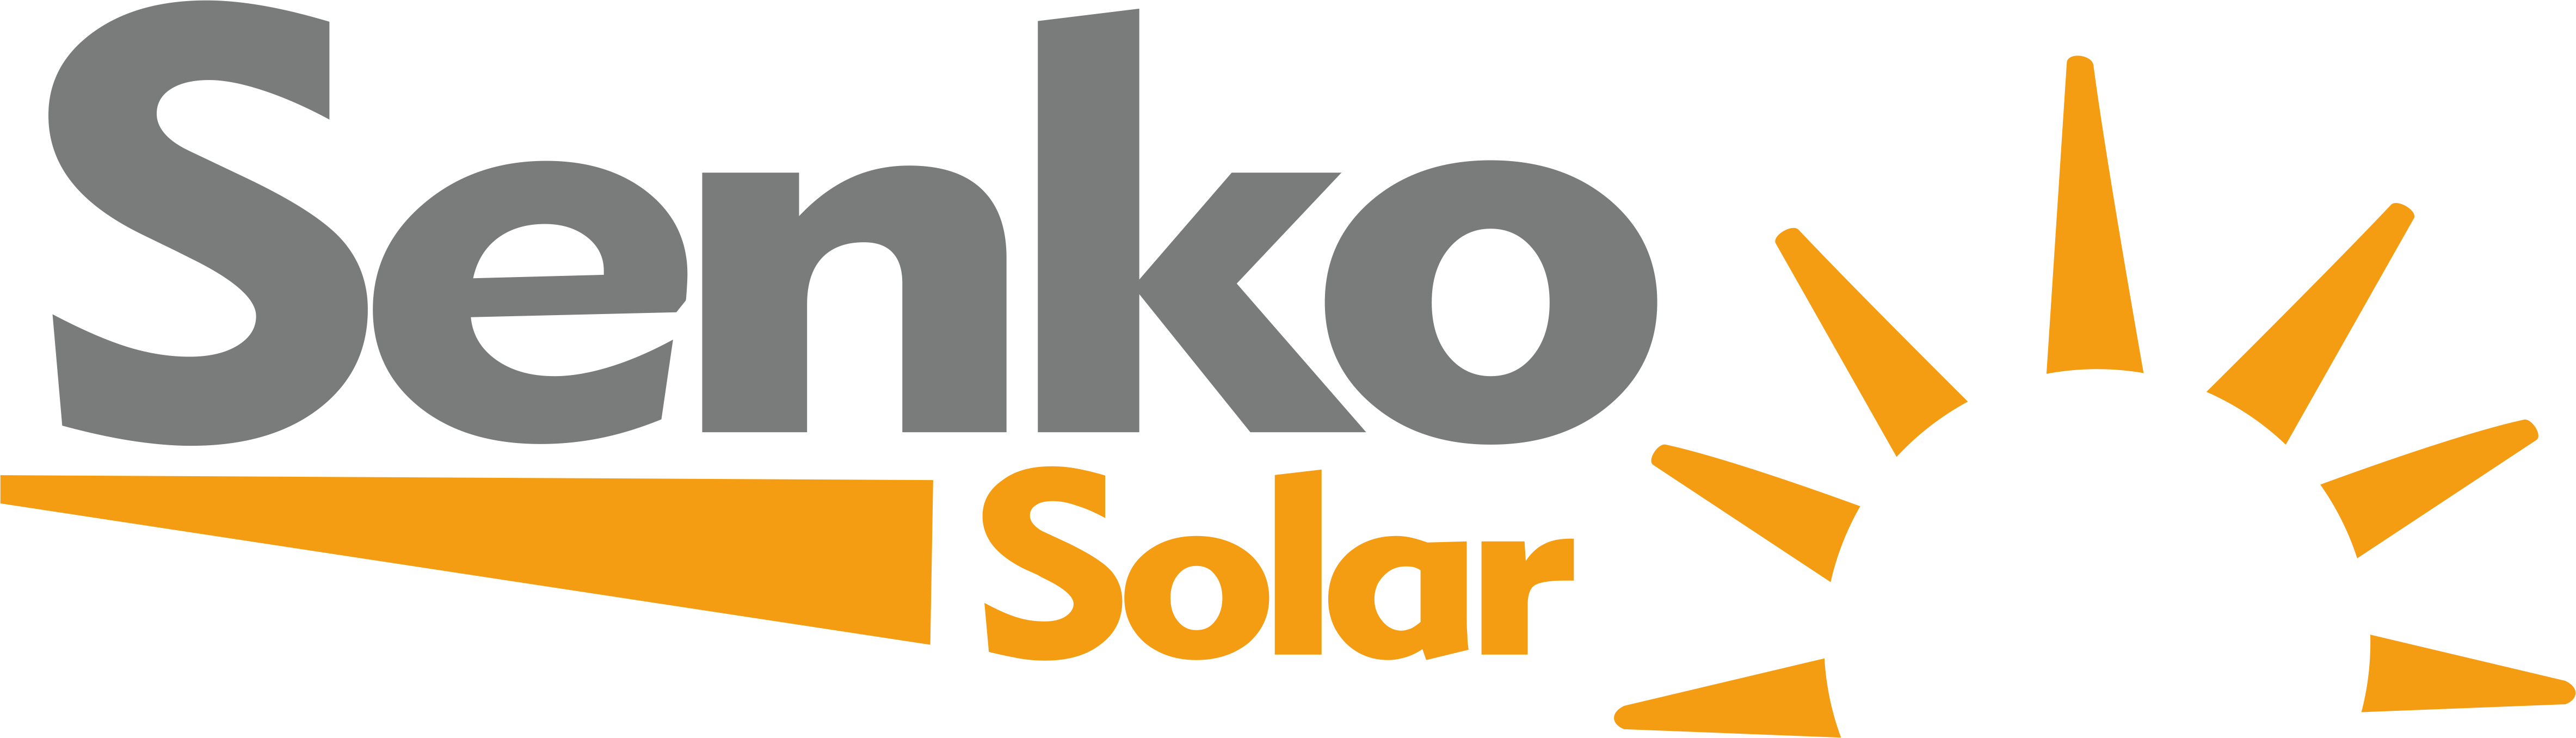 Senko Solar